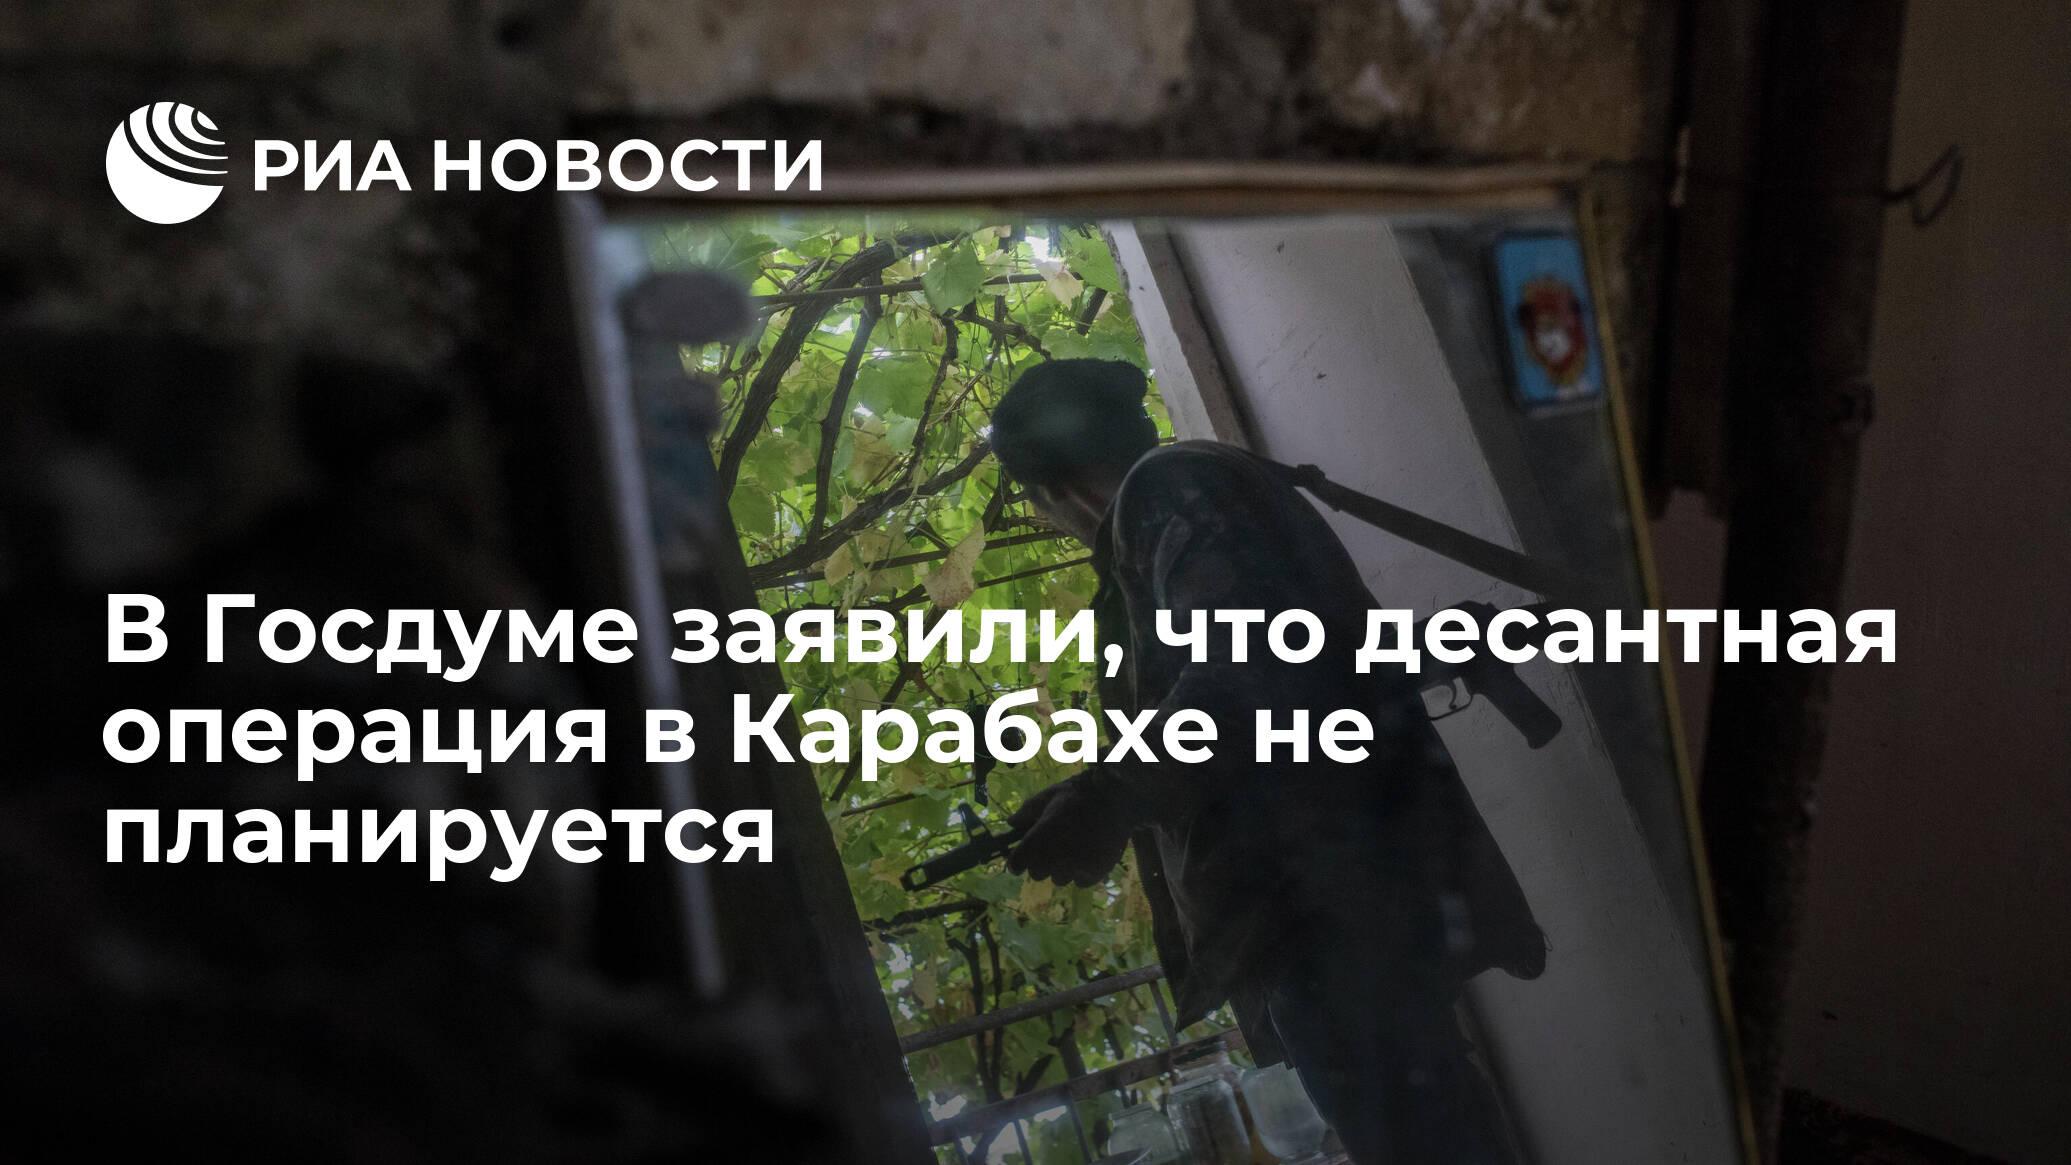 В Госдуме объяснили заявление депутата о десантной операции в Карабахе